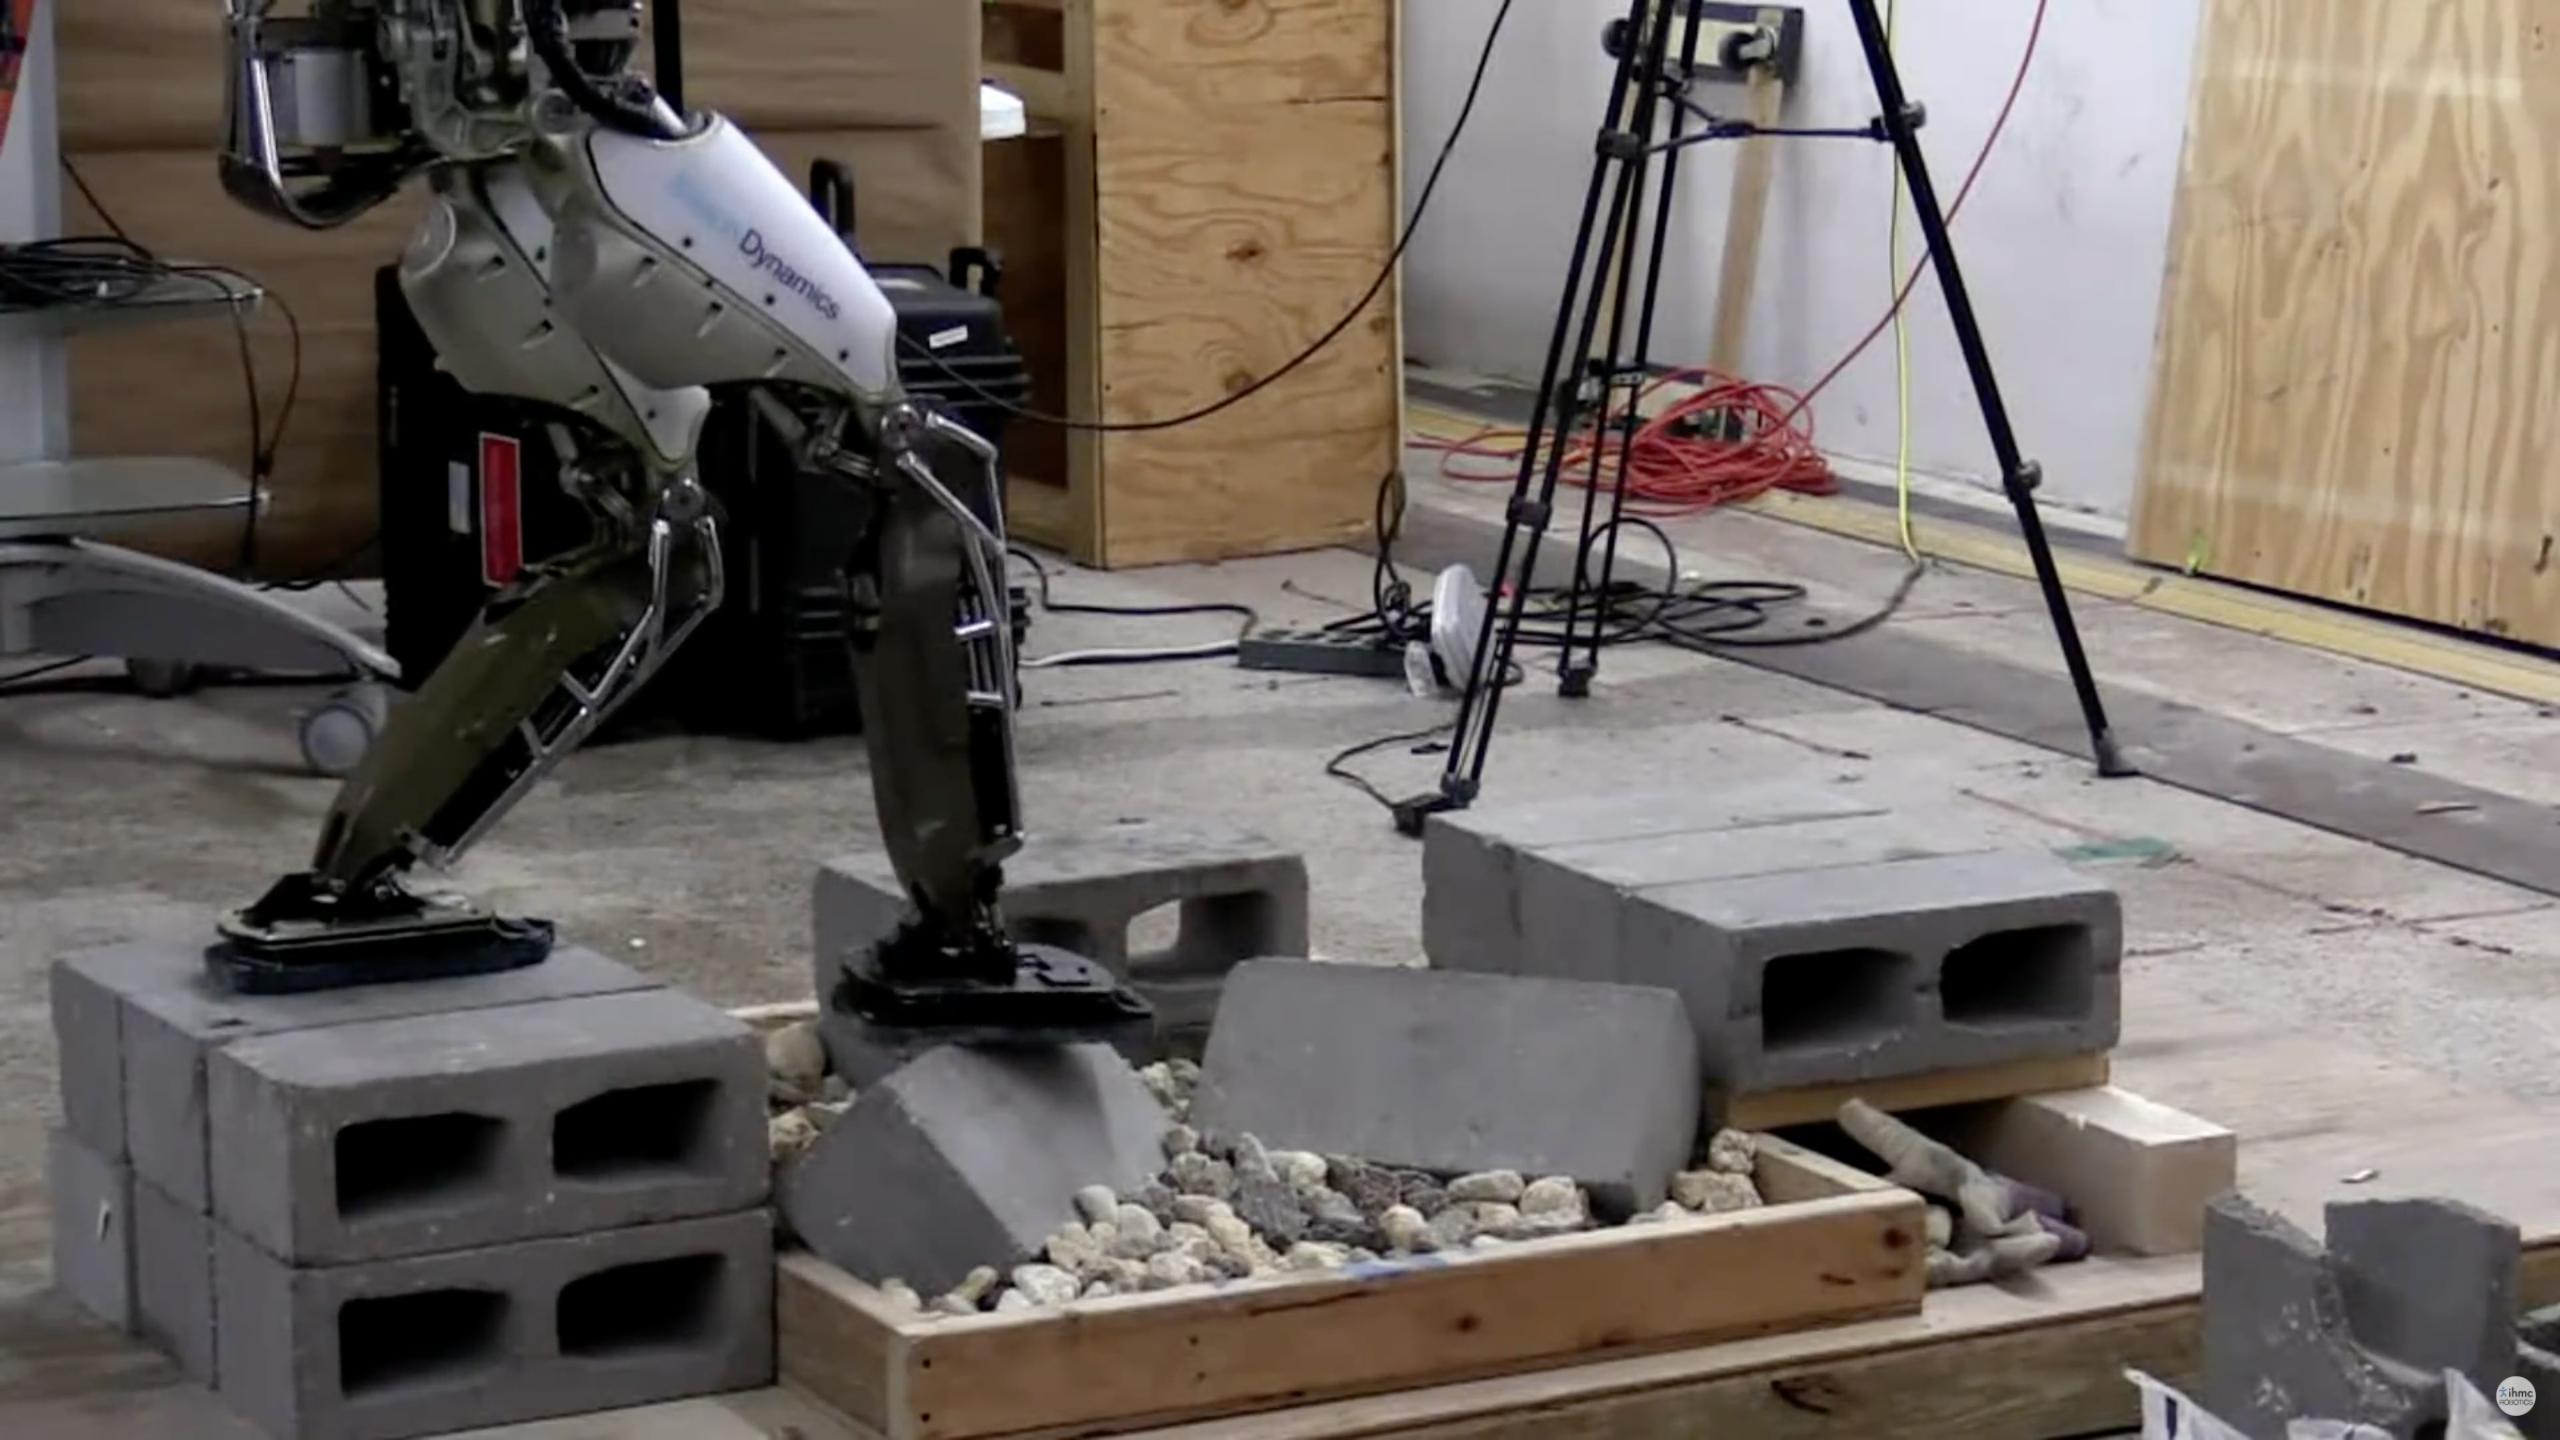 Alphabet's (GOOG) Boston Dynamics Altas robot can now traverse rocky terrain thanks to the IHMC